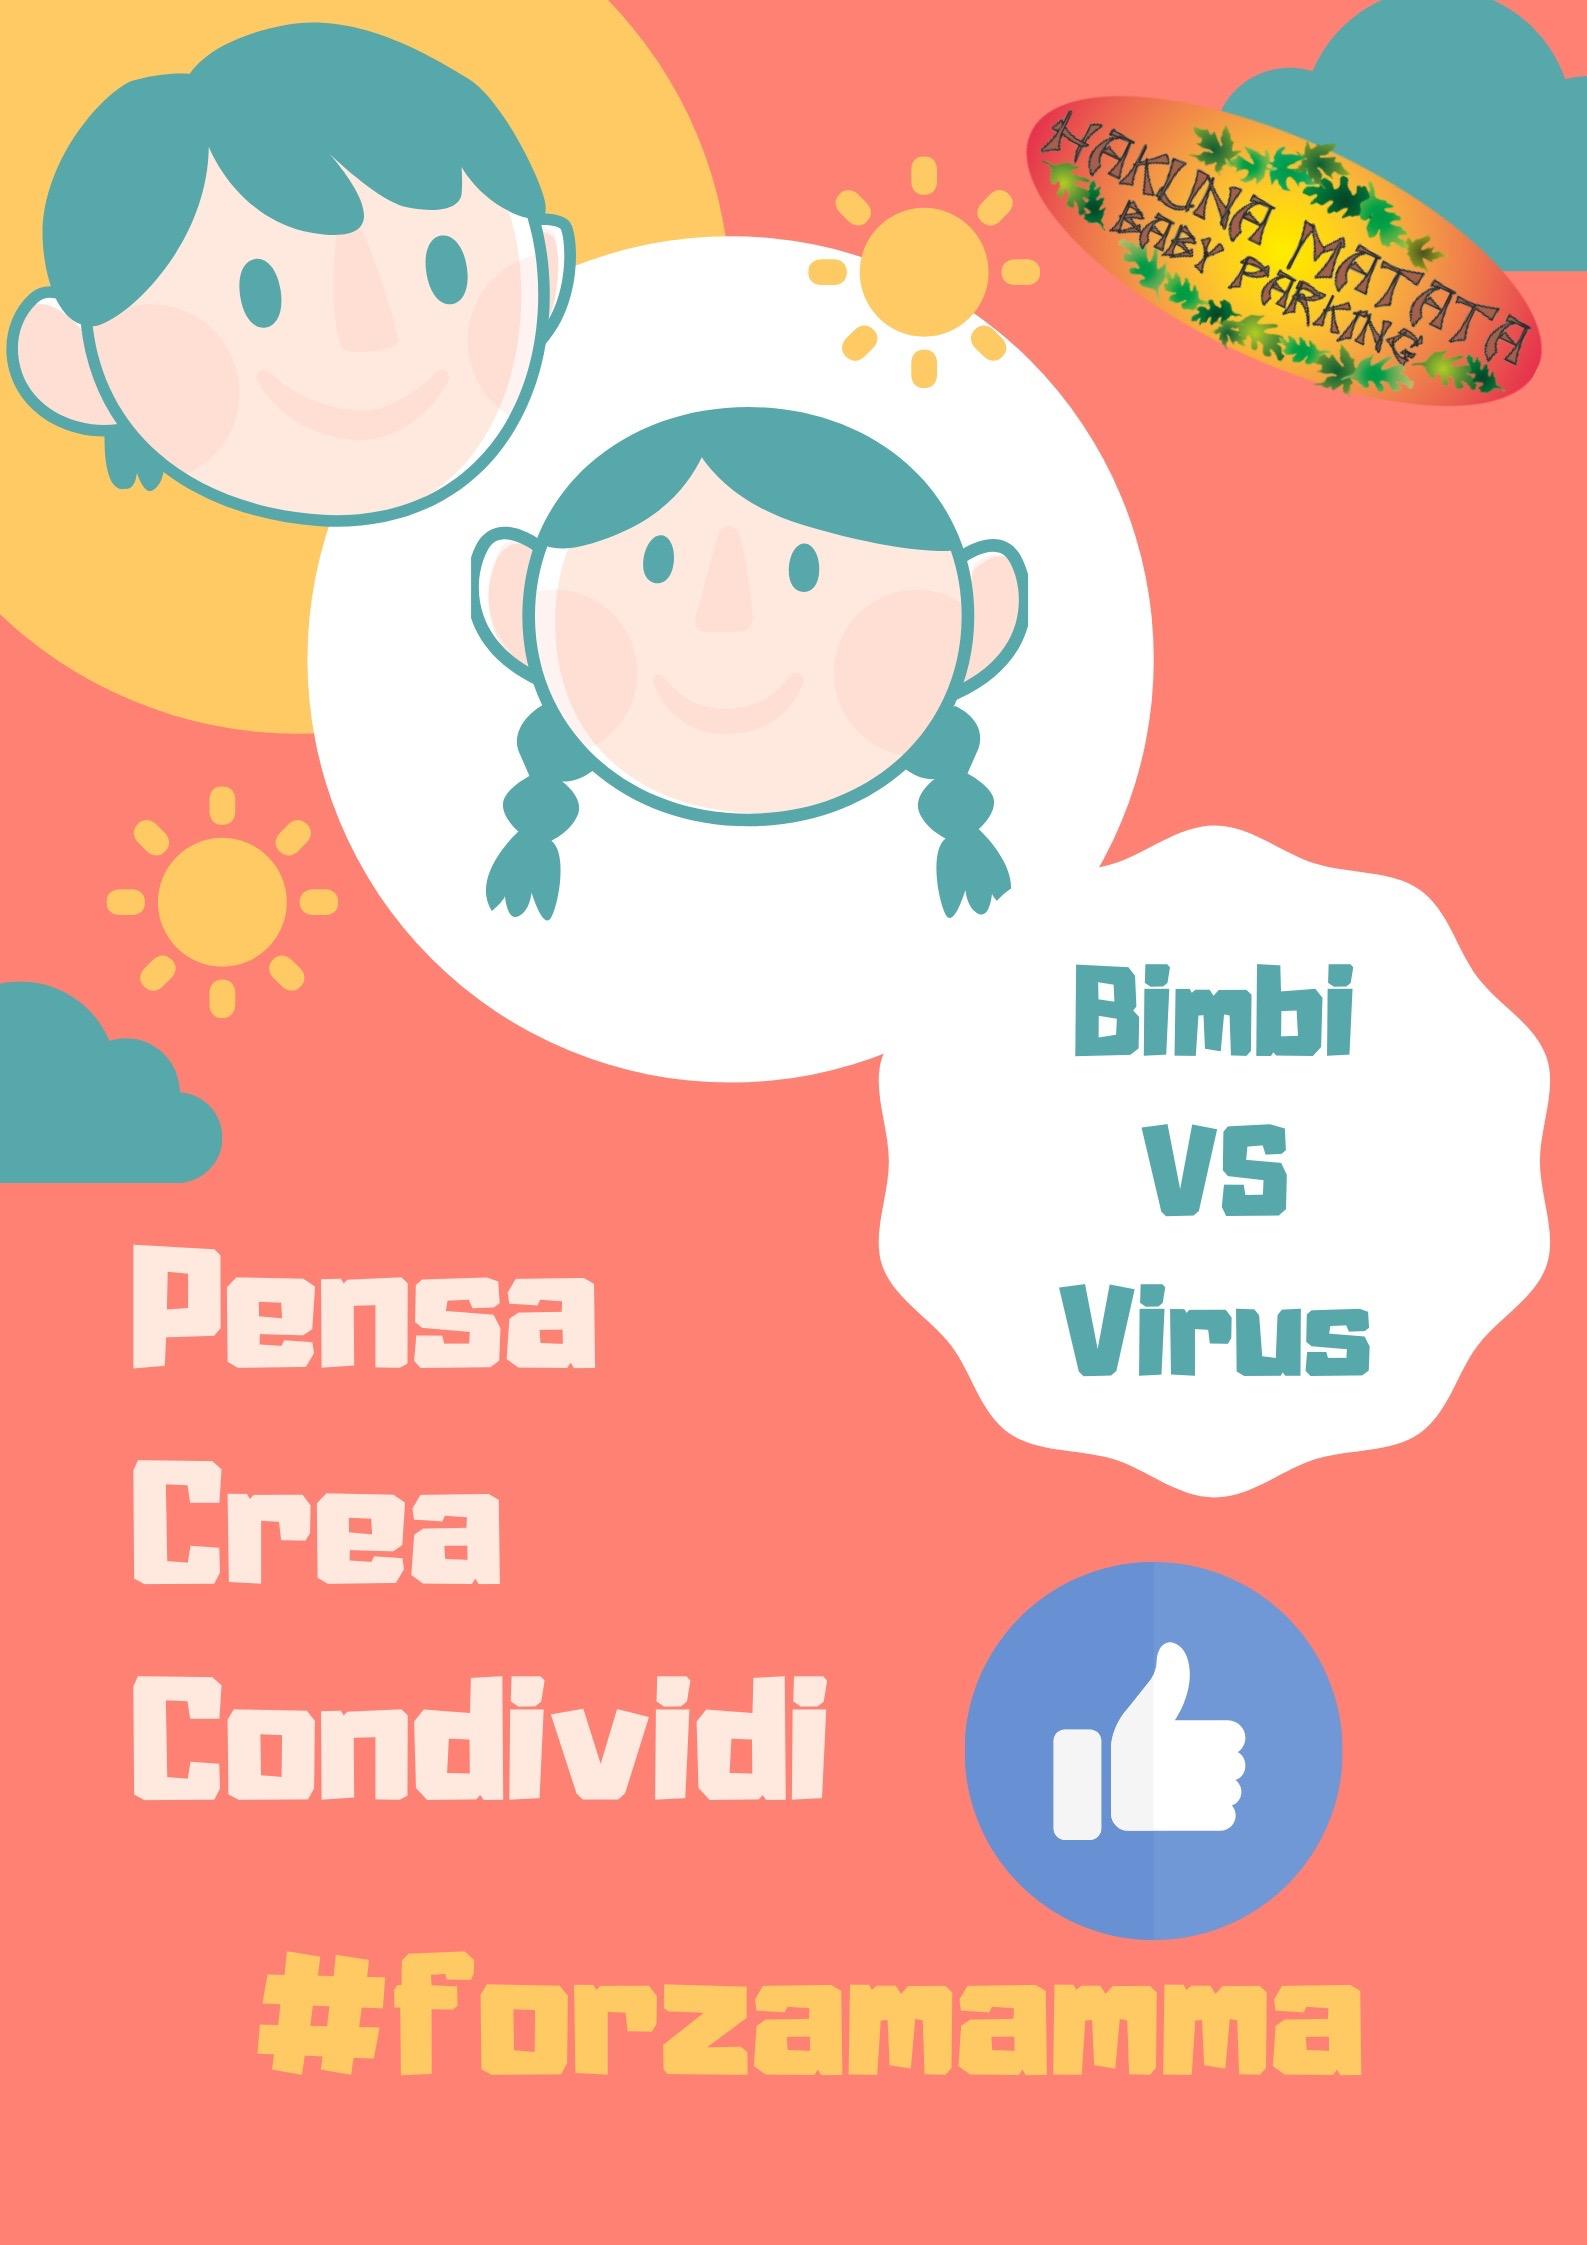 bimbi VS virus